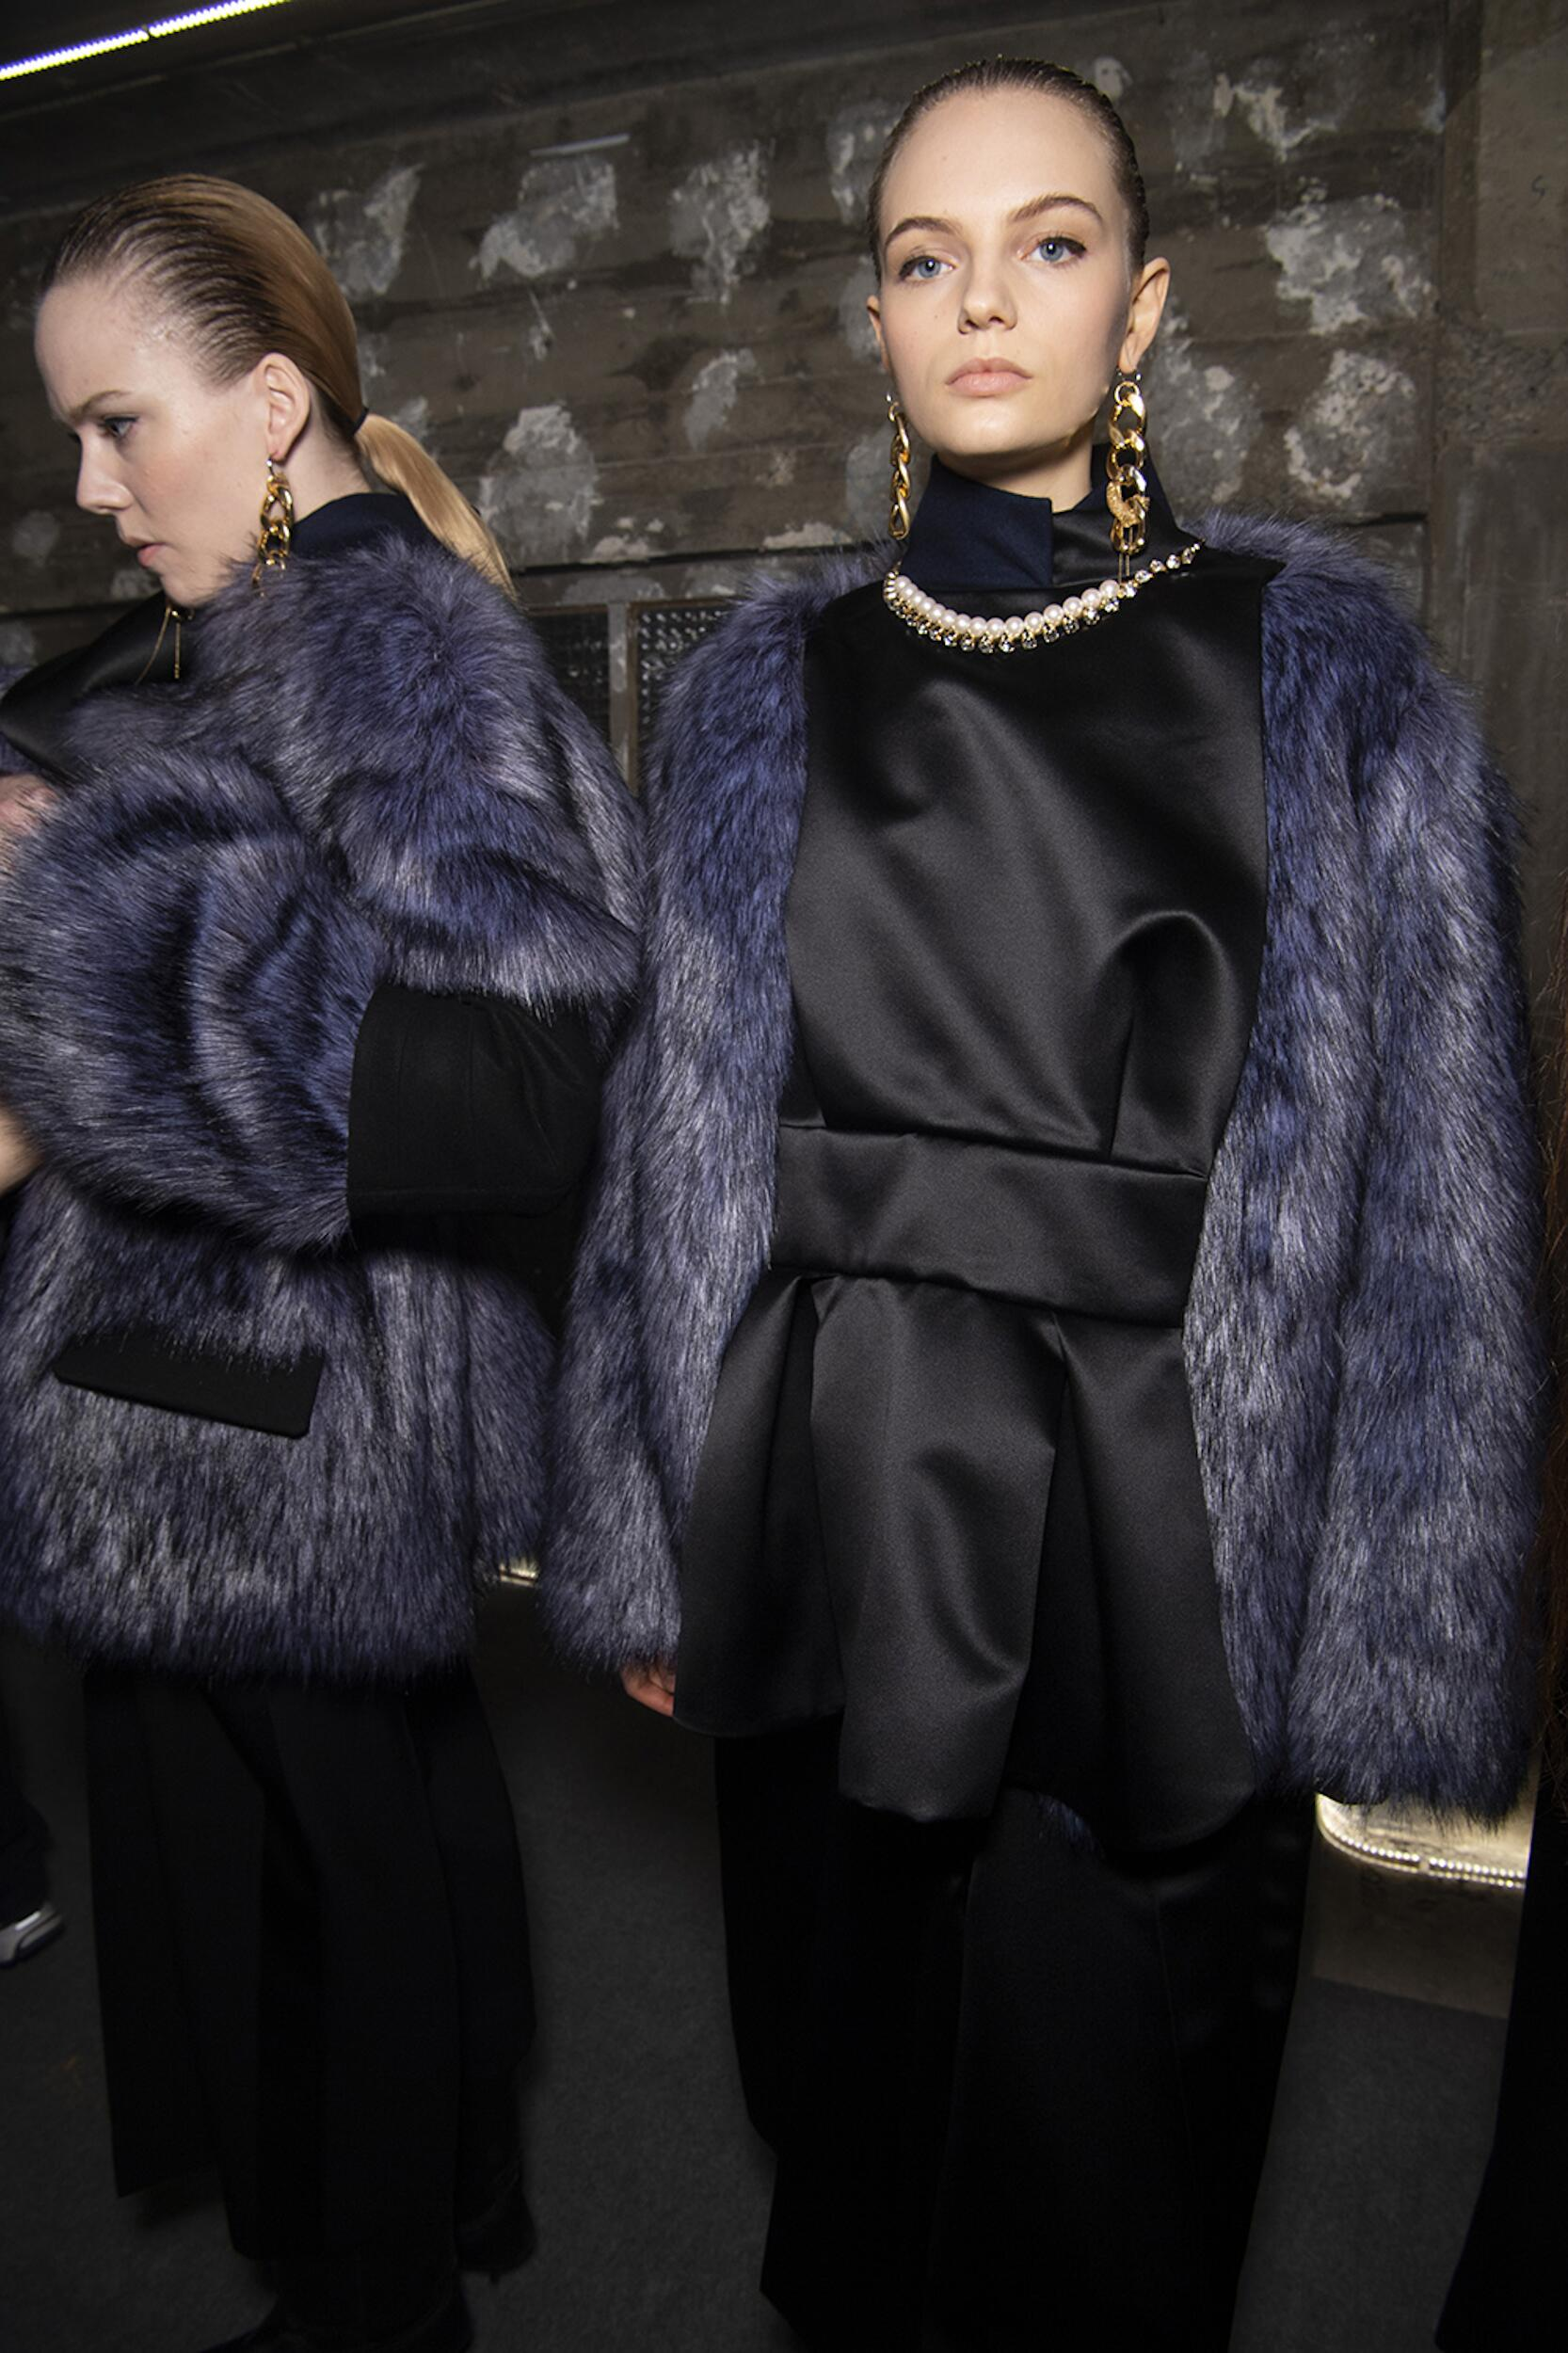 Backstage Sacai Models 2020